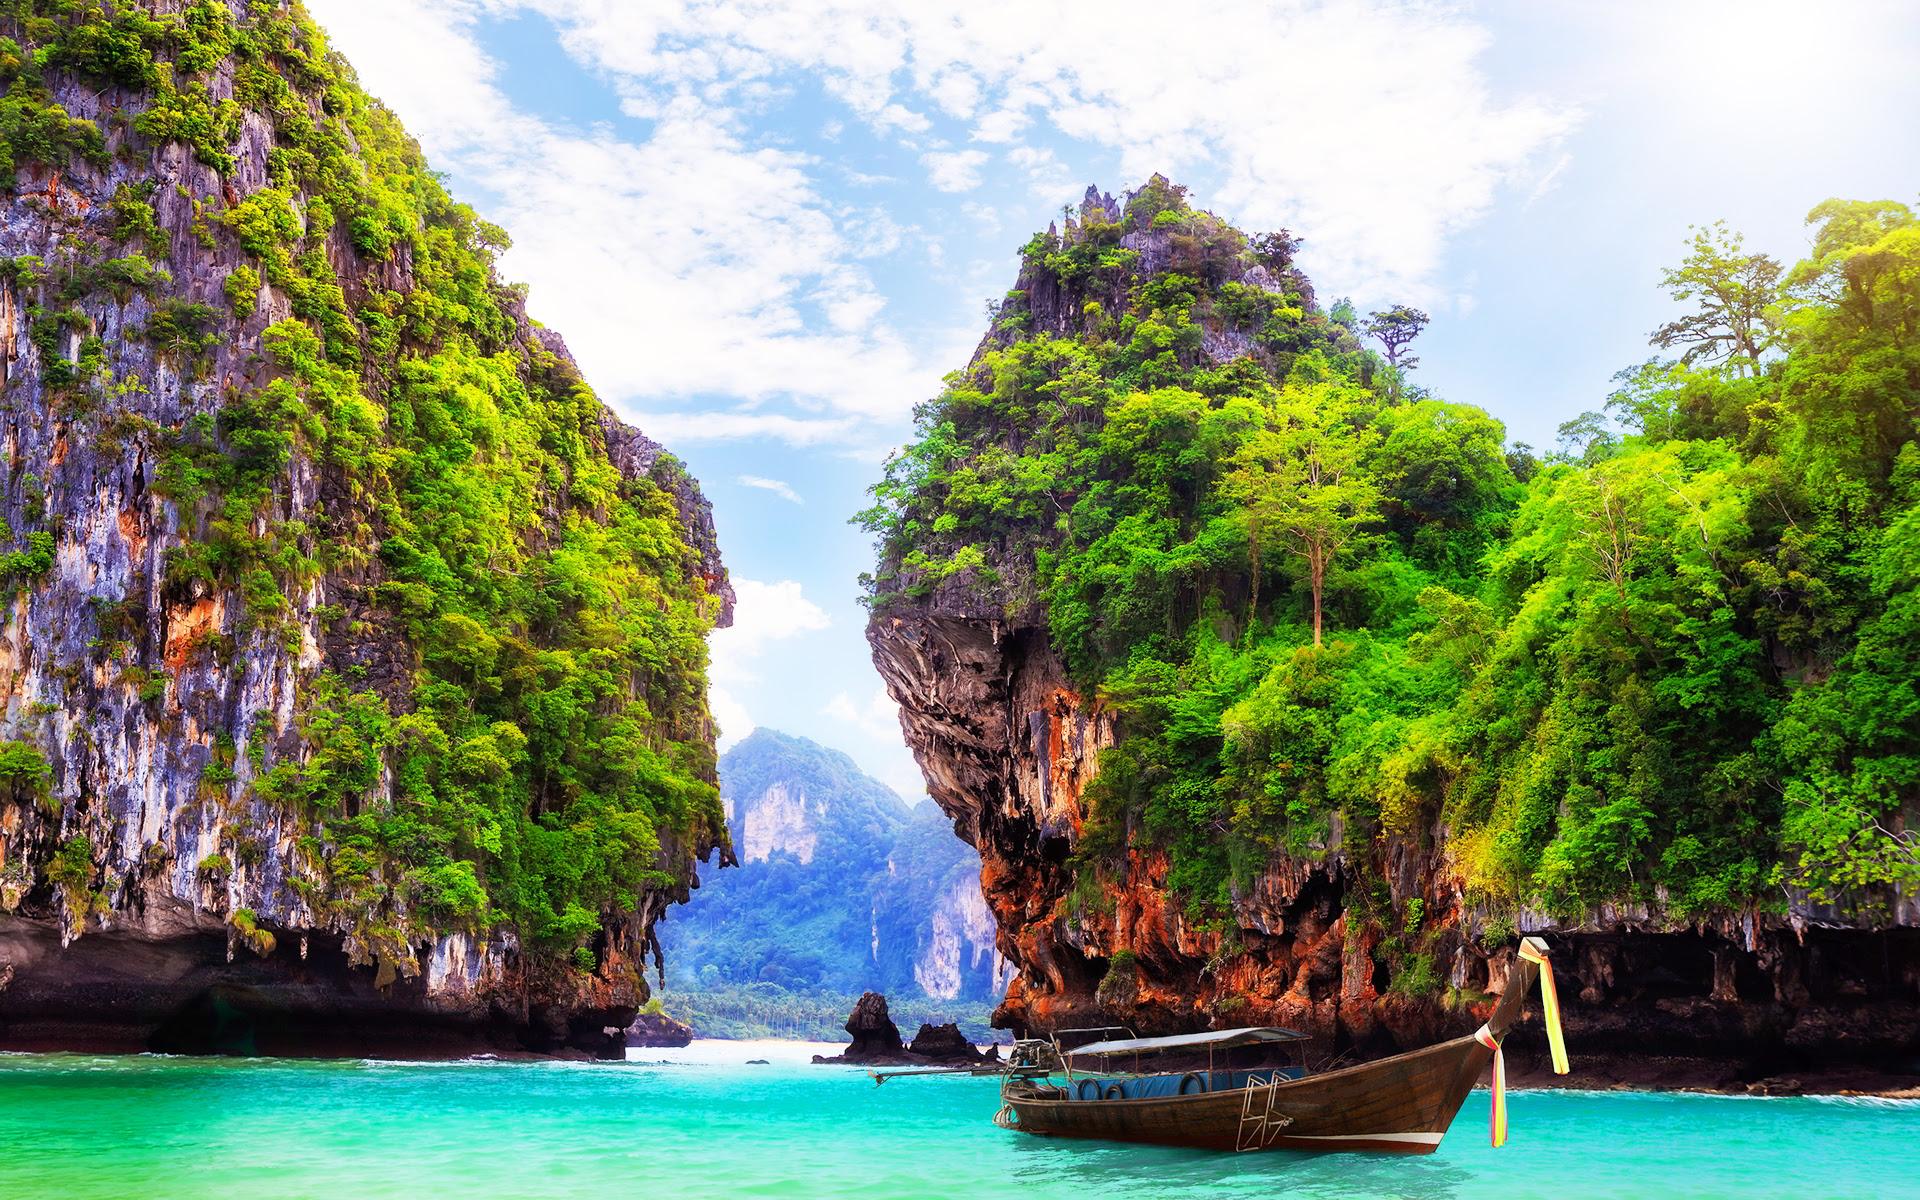 thailand vacation | HD Desktop Wallpapers | 4k HD